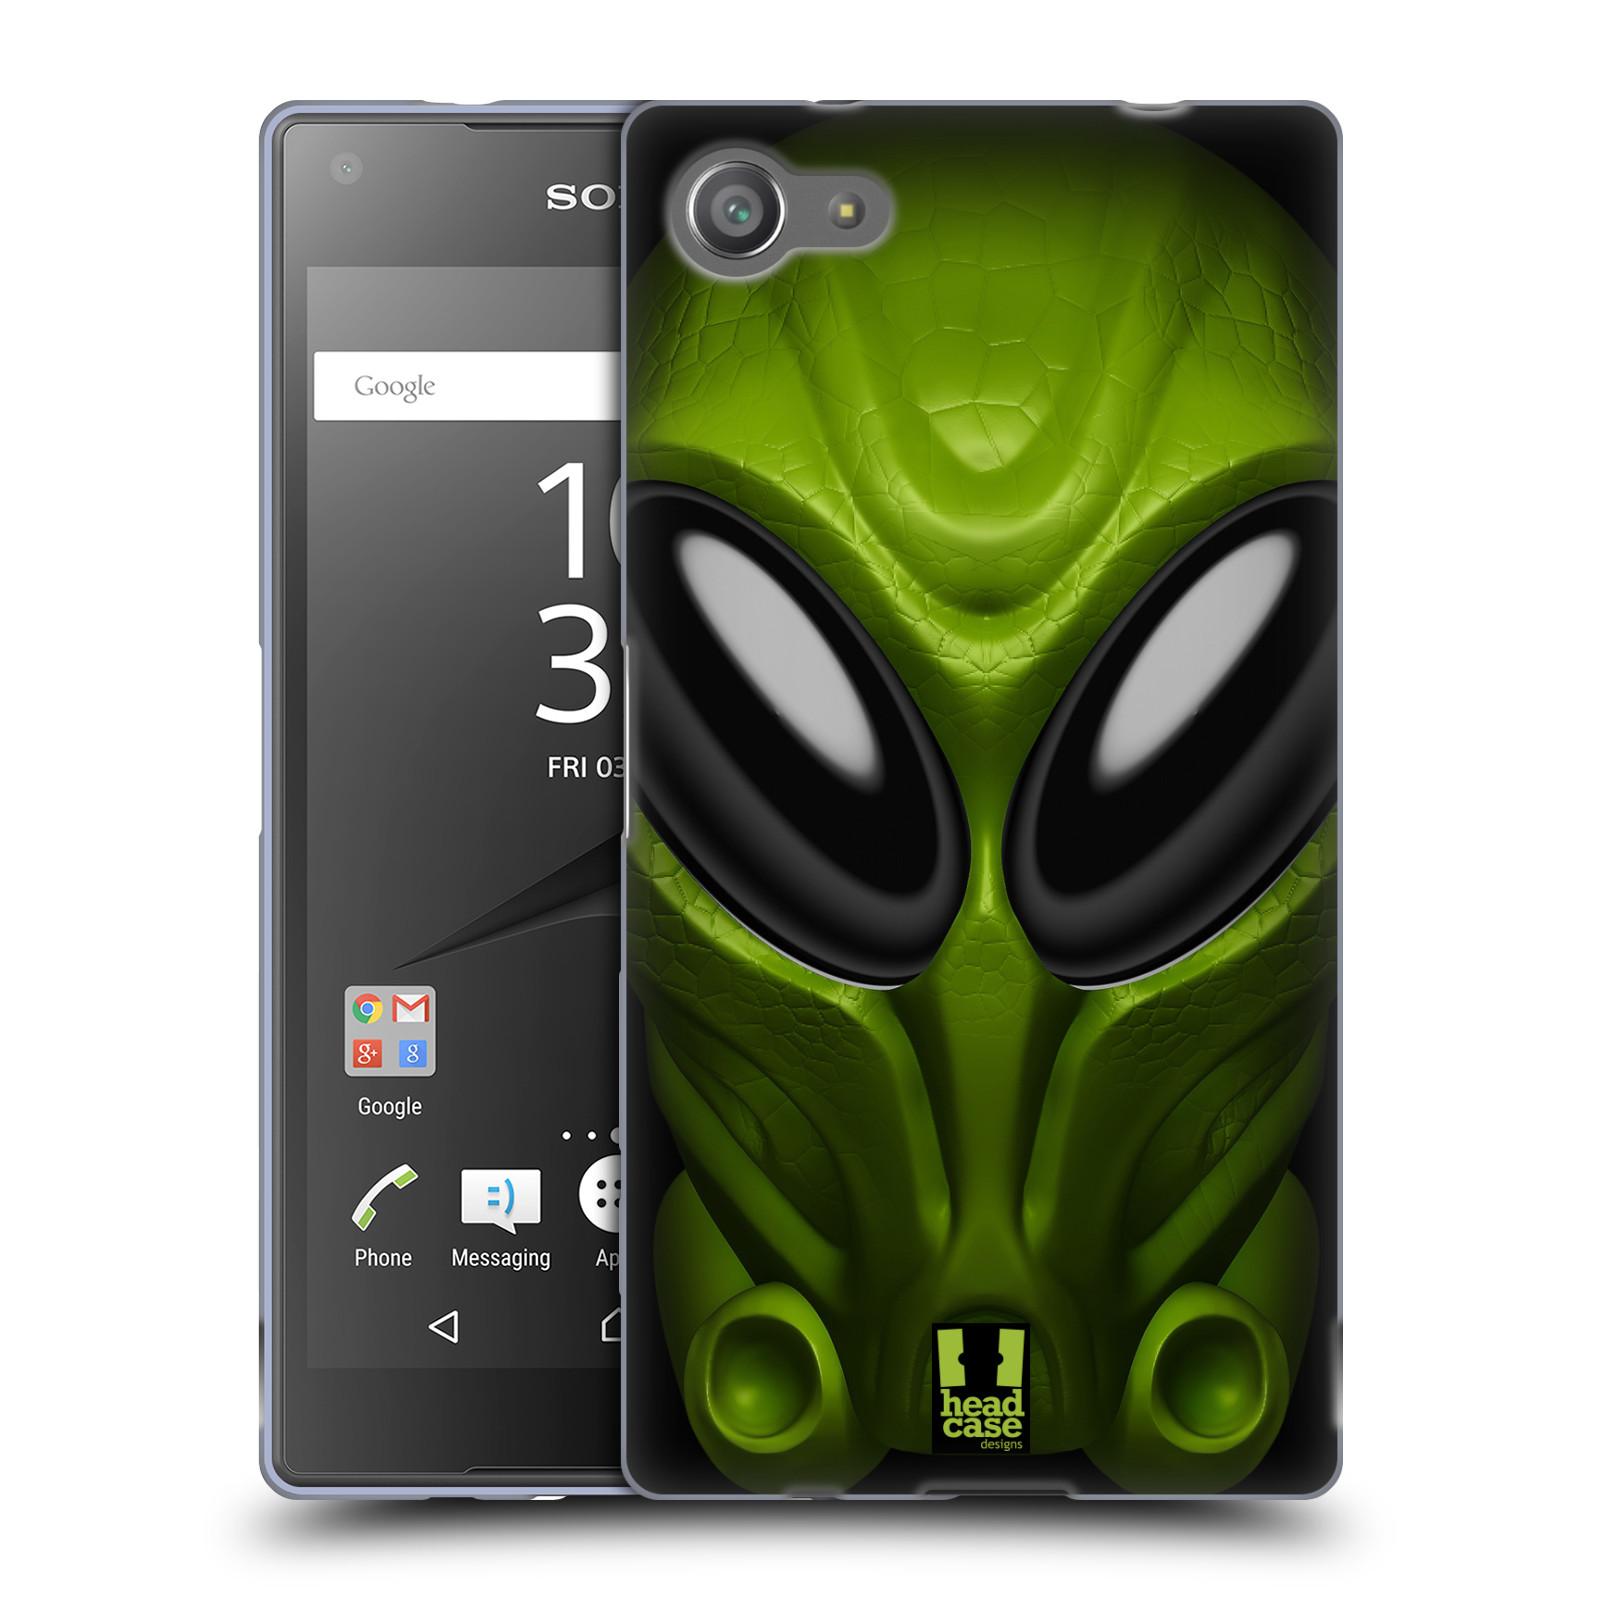 Silikonové pouzdro na mobil Sony Xperia Z5 Compact - Head Case - Ufoun Mastermind